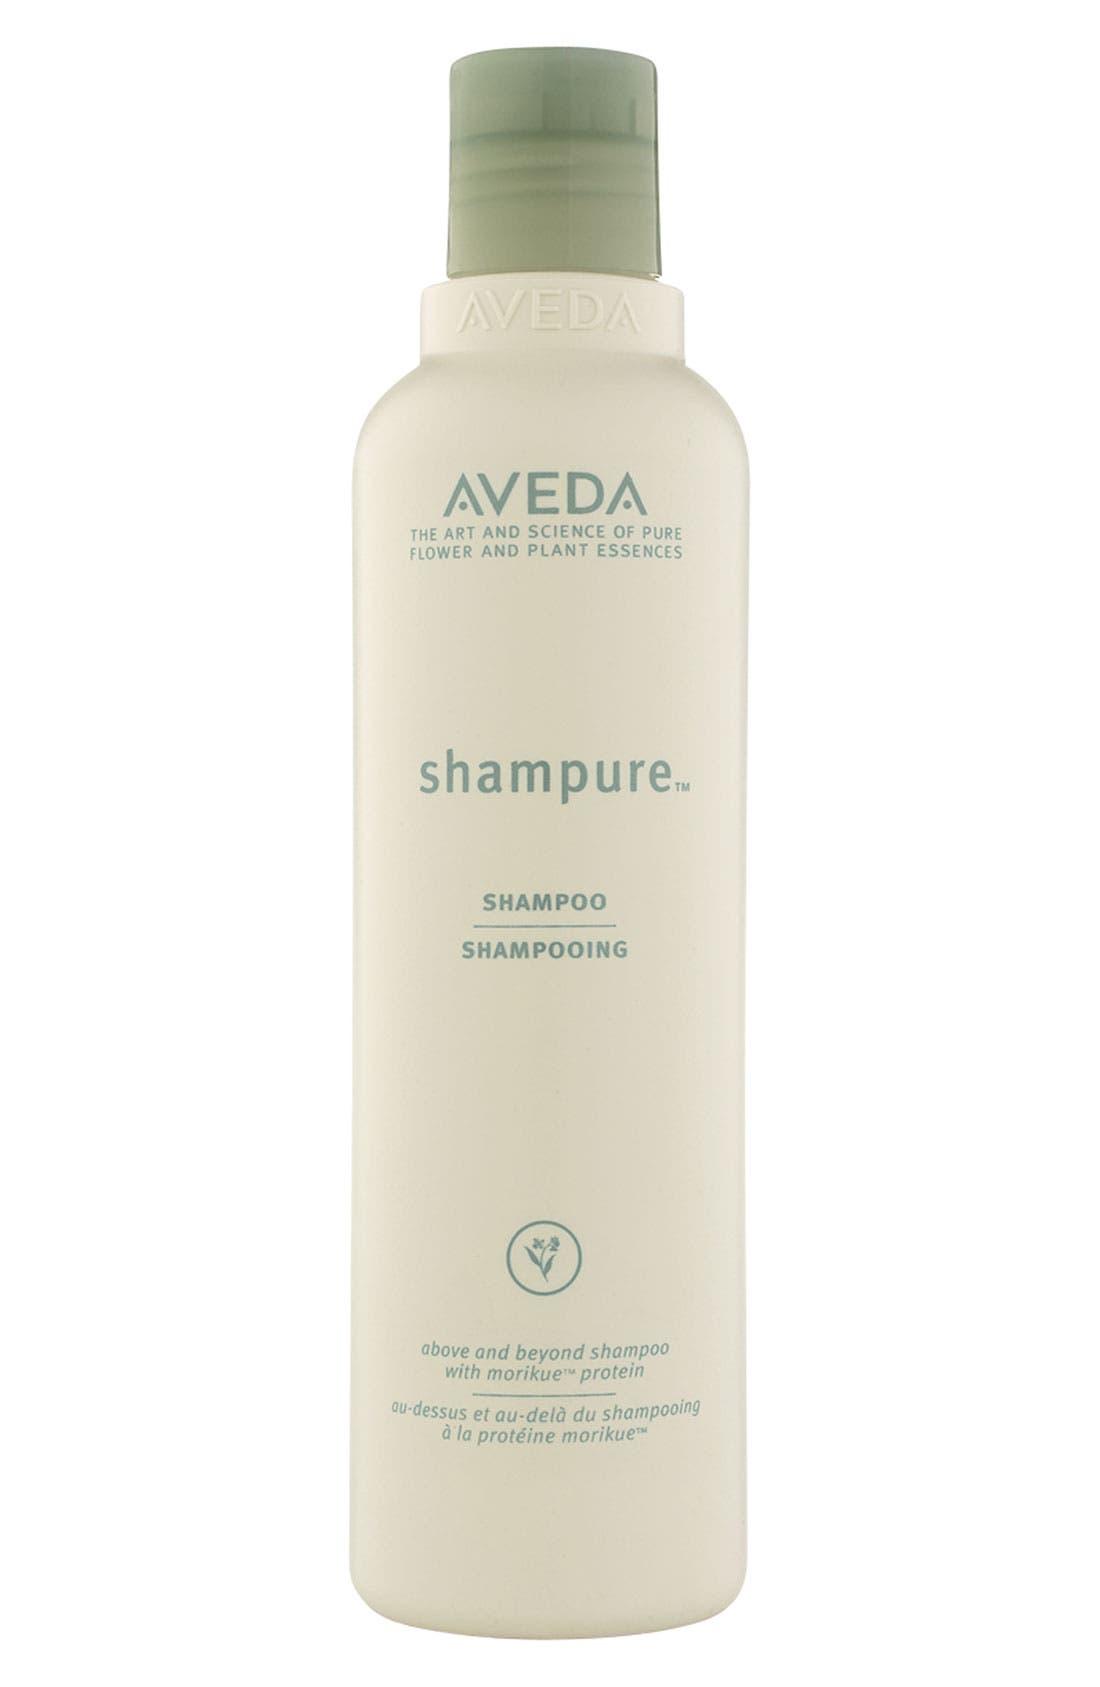 Aveda shampure™ Shampoo